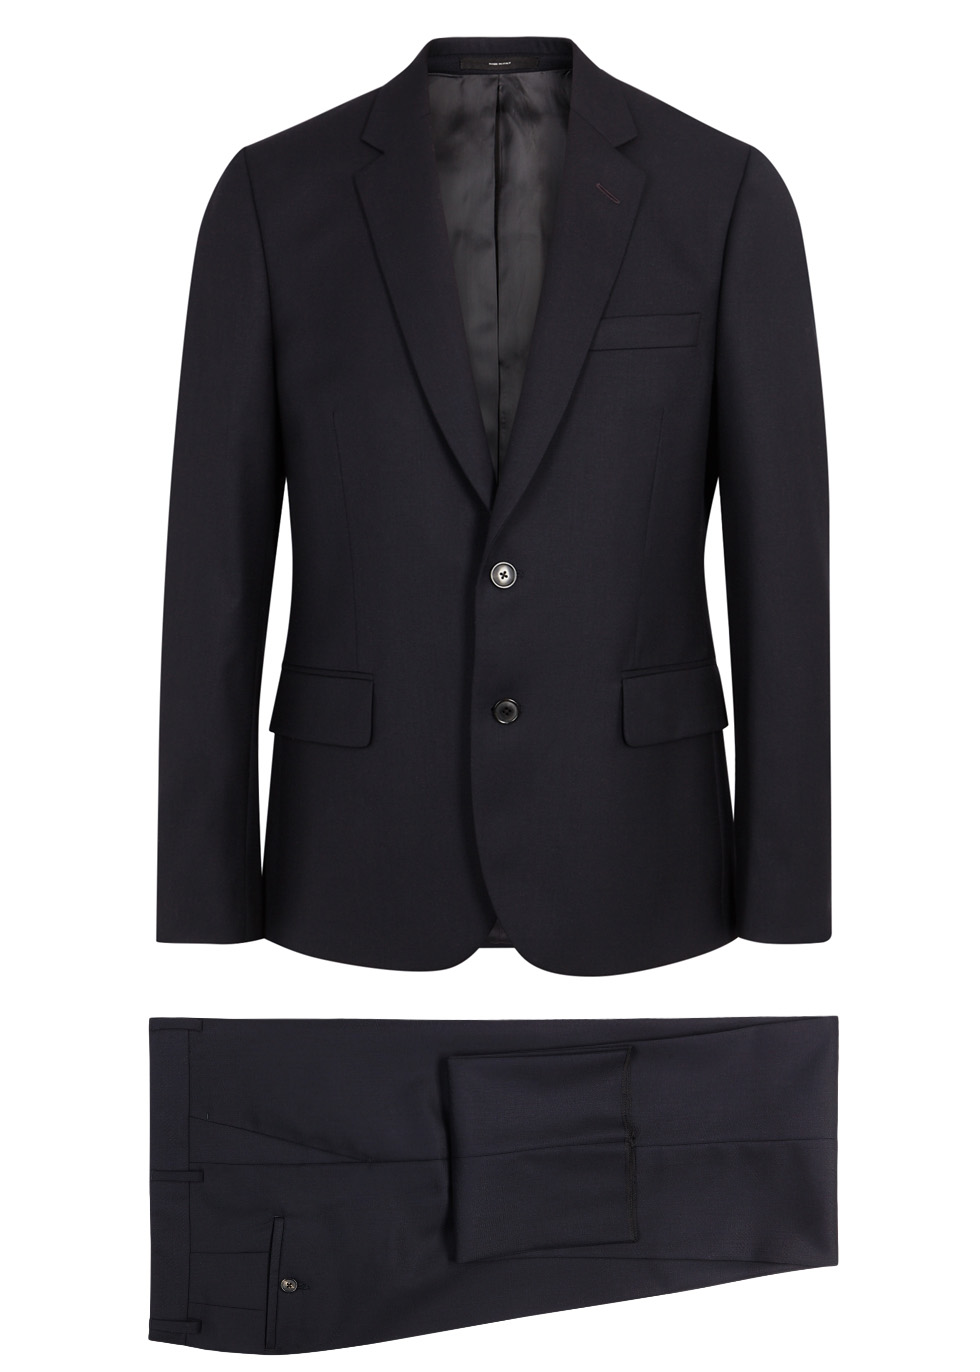 Soho slim-fit wool travel suit - Paul Smith